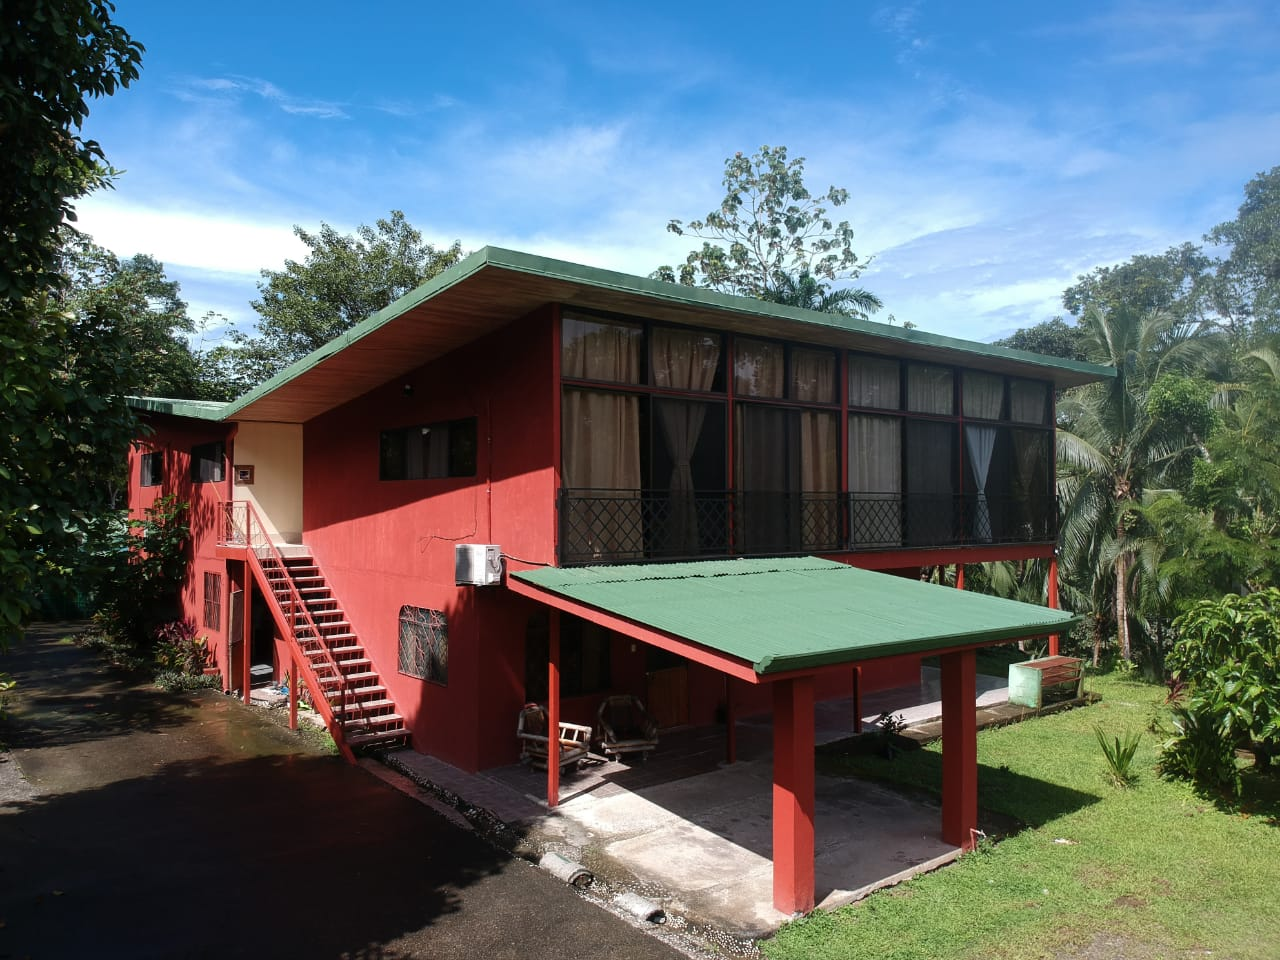 7 Apt Building For Sale